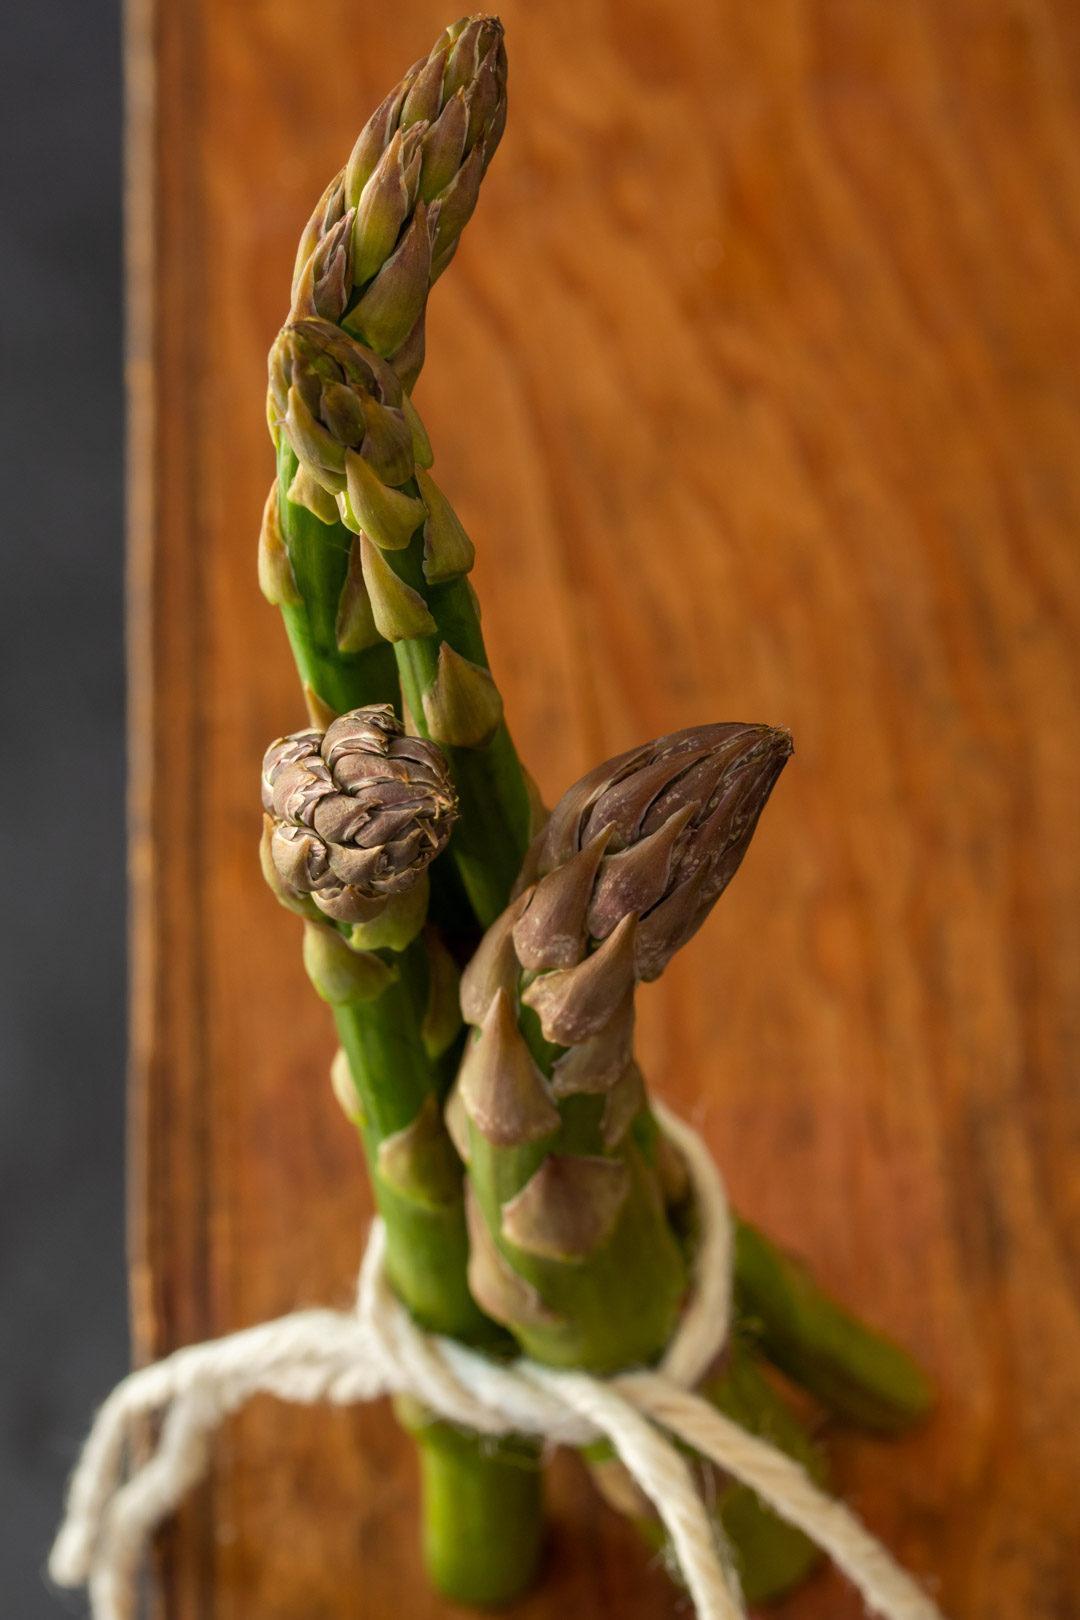 asparagus & lemon tart: asparagus still life on wooden box